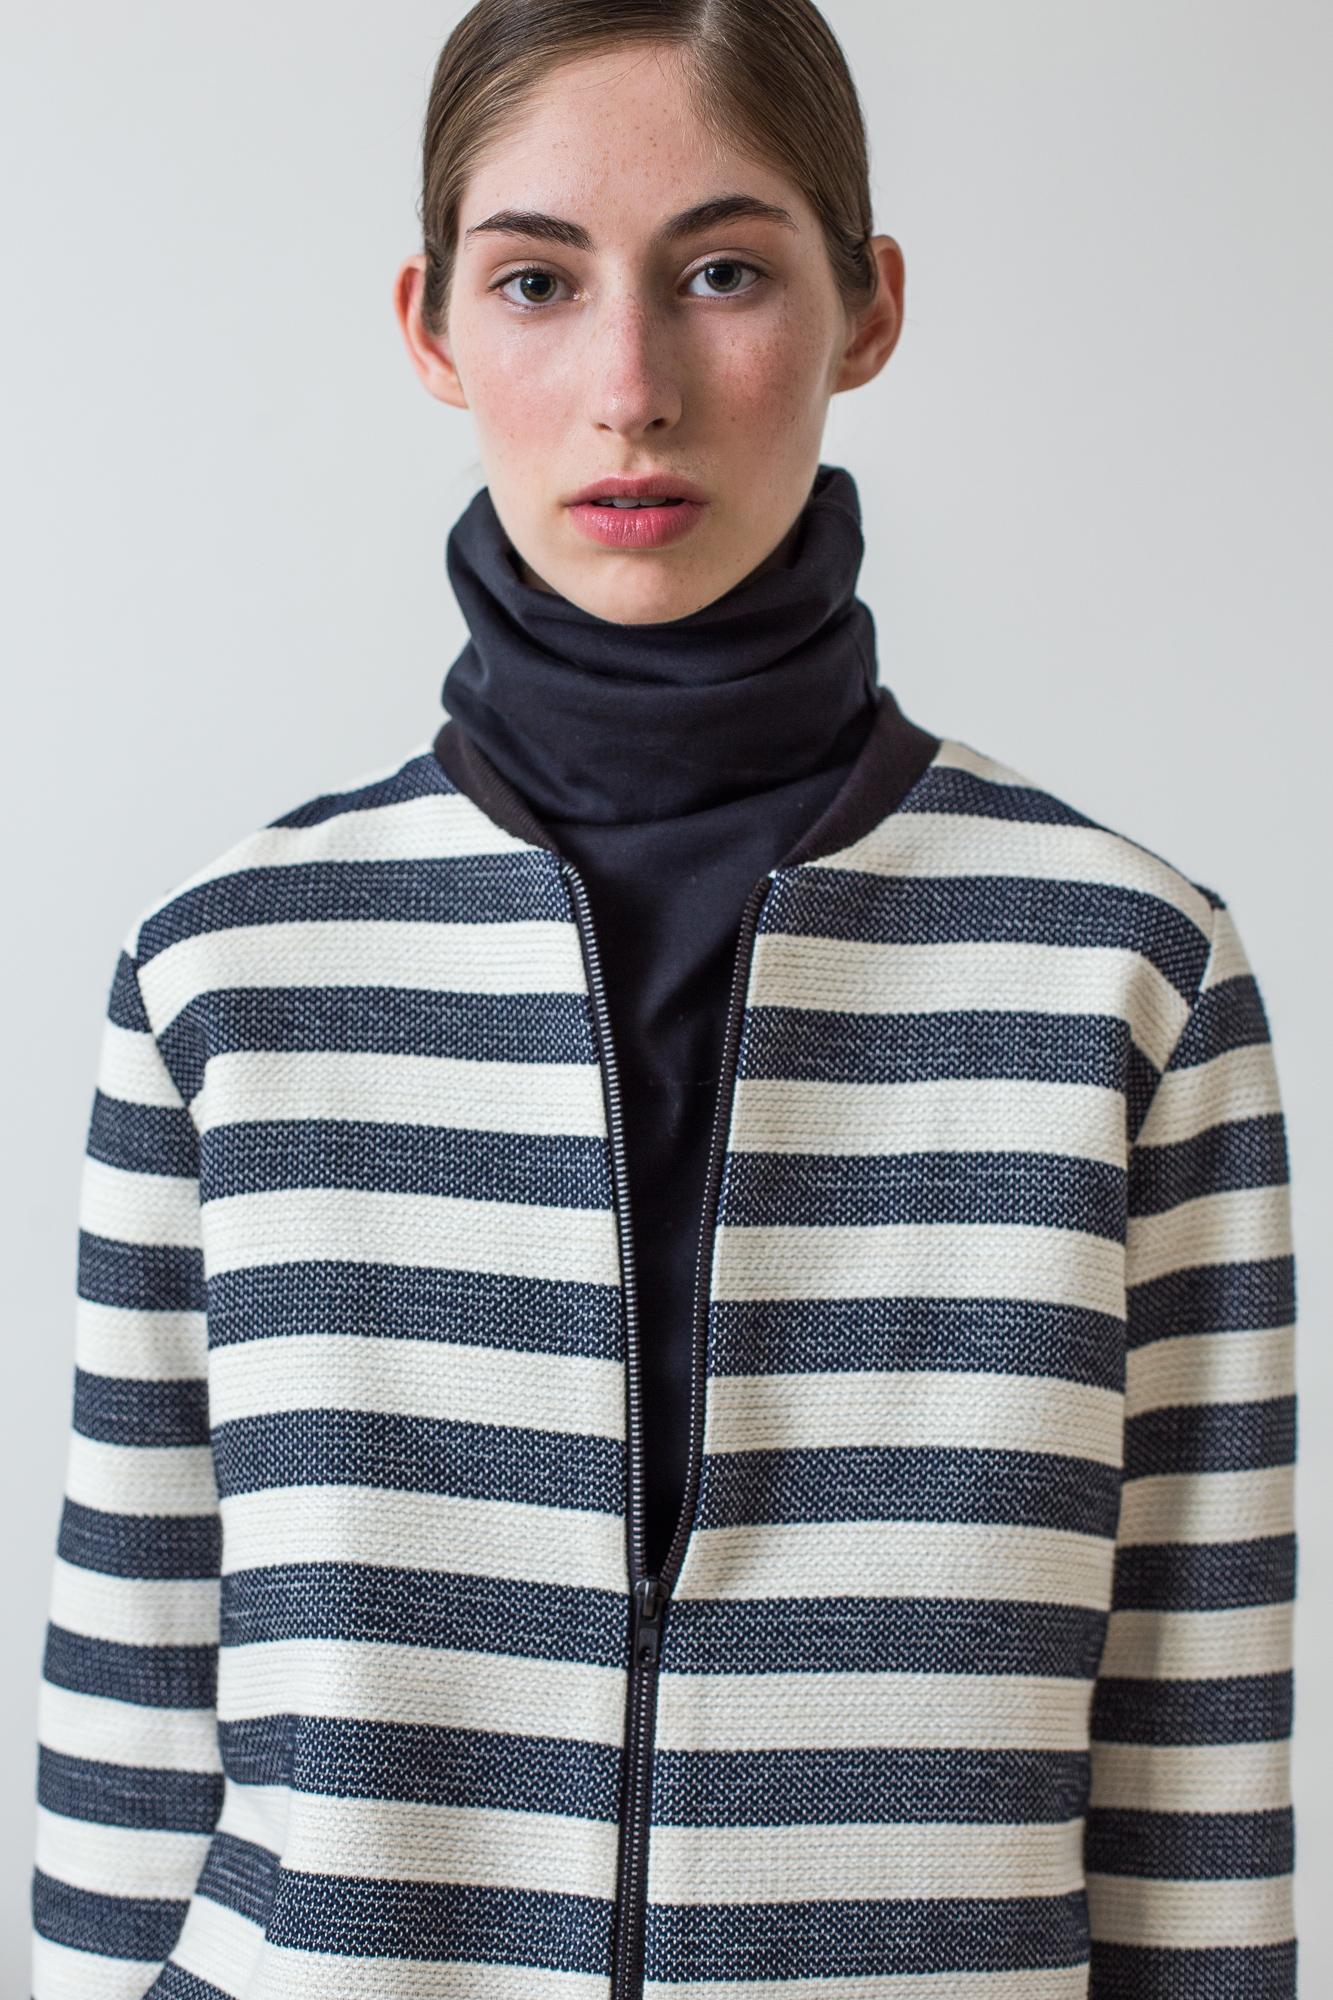 wearenotsisters_wrns_contour-jacket_04